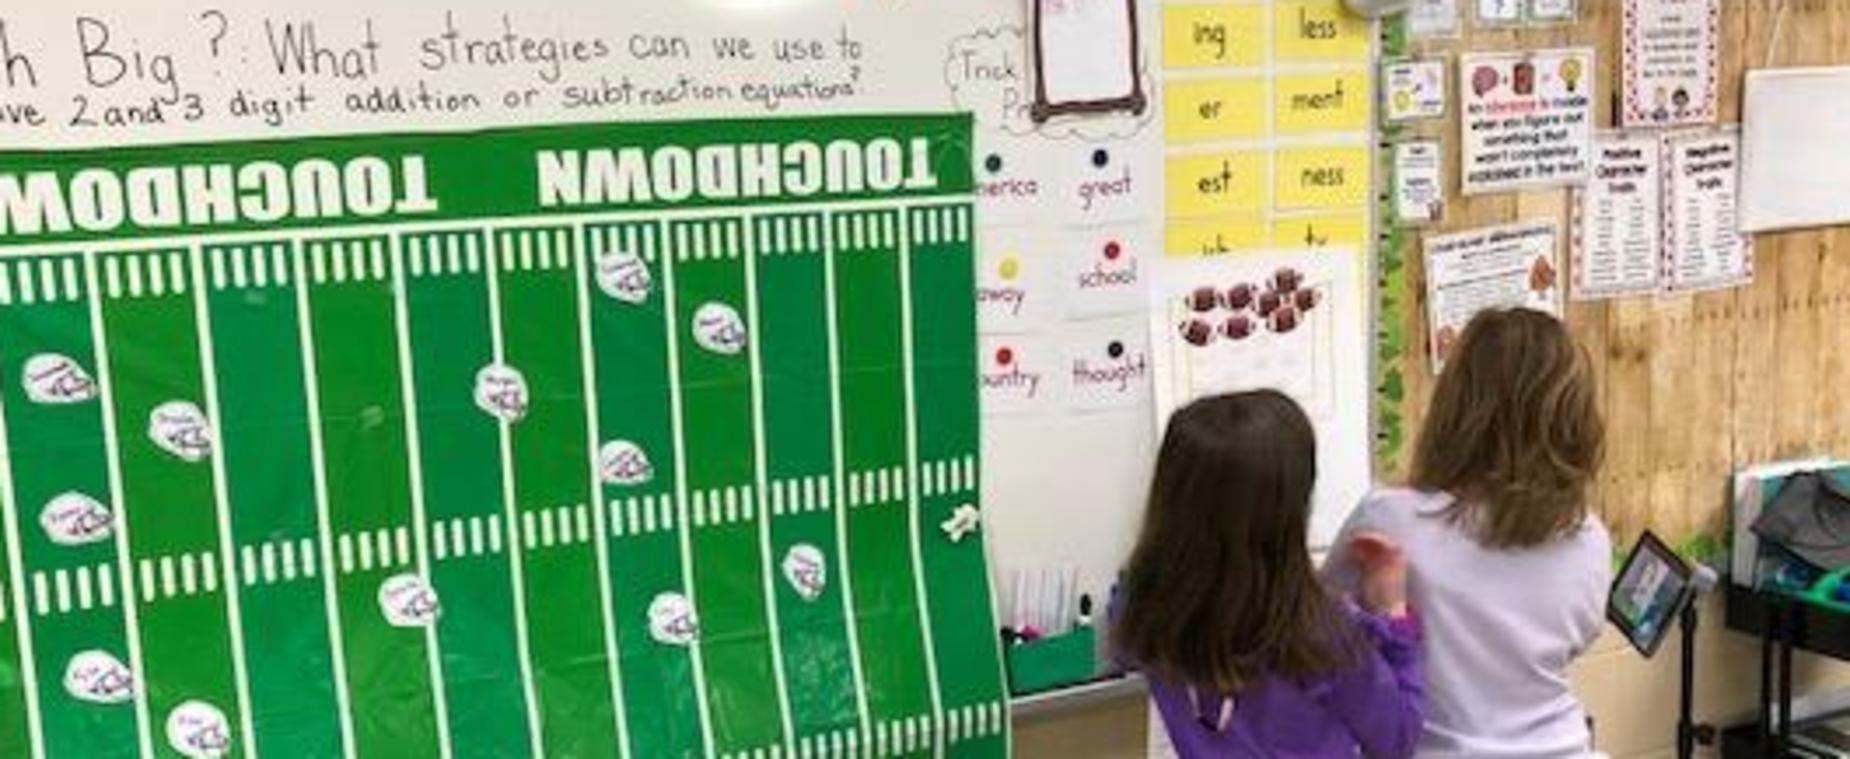 Super Bowl Fun 2nd Grade Math!